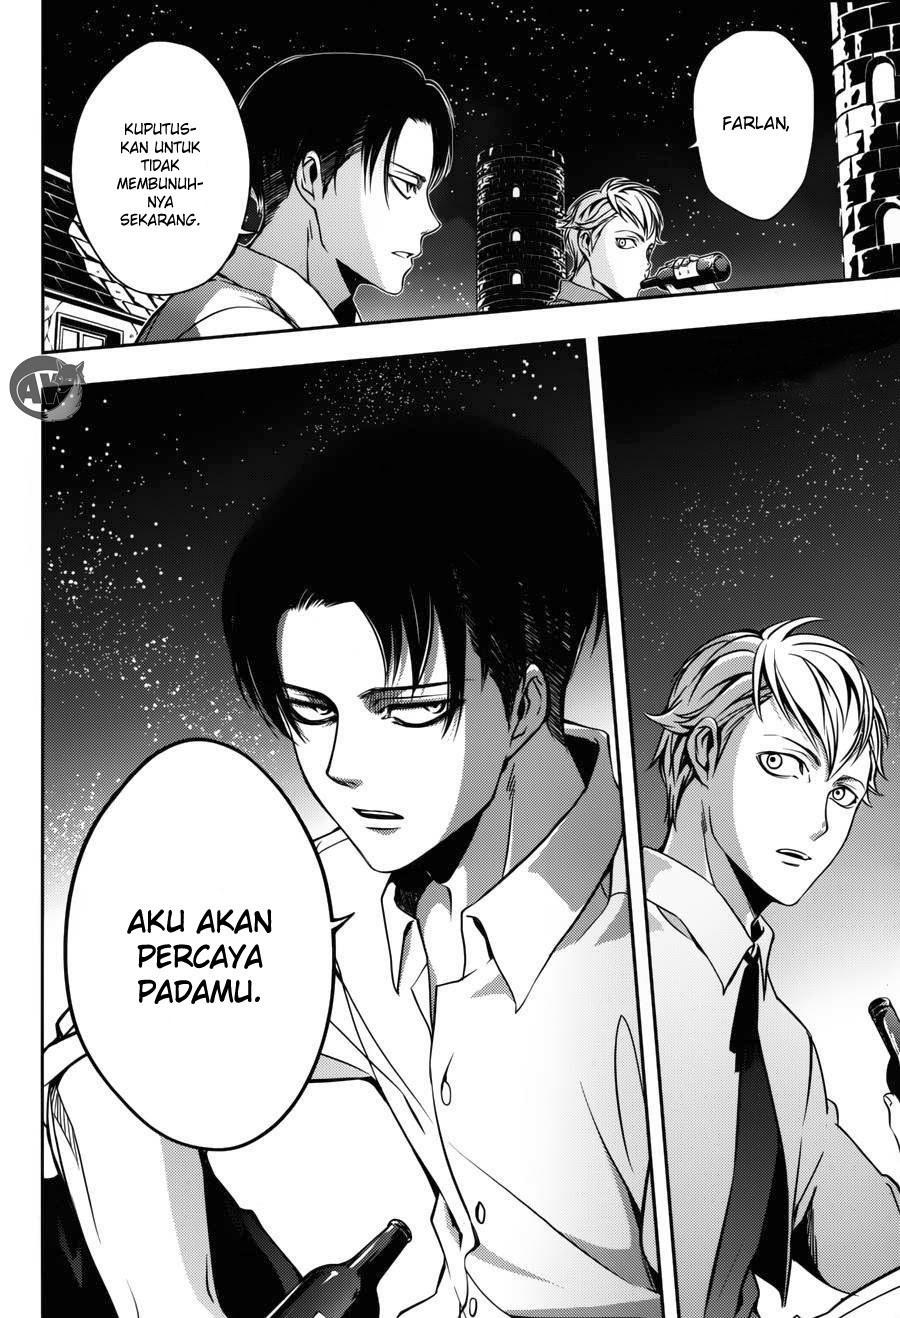 Komik shingeki no kyojin gaiden 002 - chapter 2 3 Indonesia shingeki no kyojin gaiden 002 - chapter 2 Terbaru 33|Baca Manga Komik Indonesia|